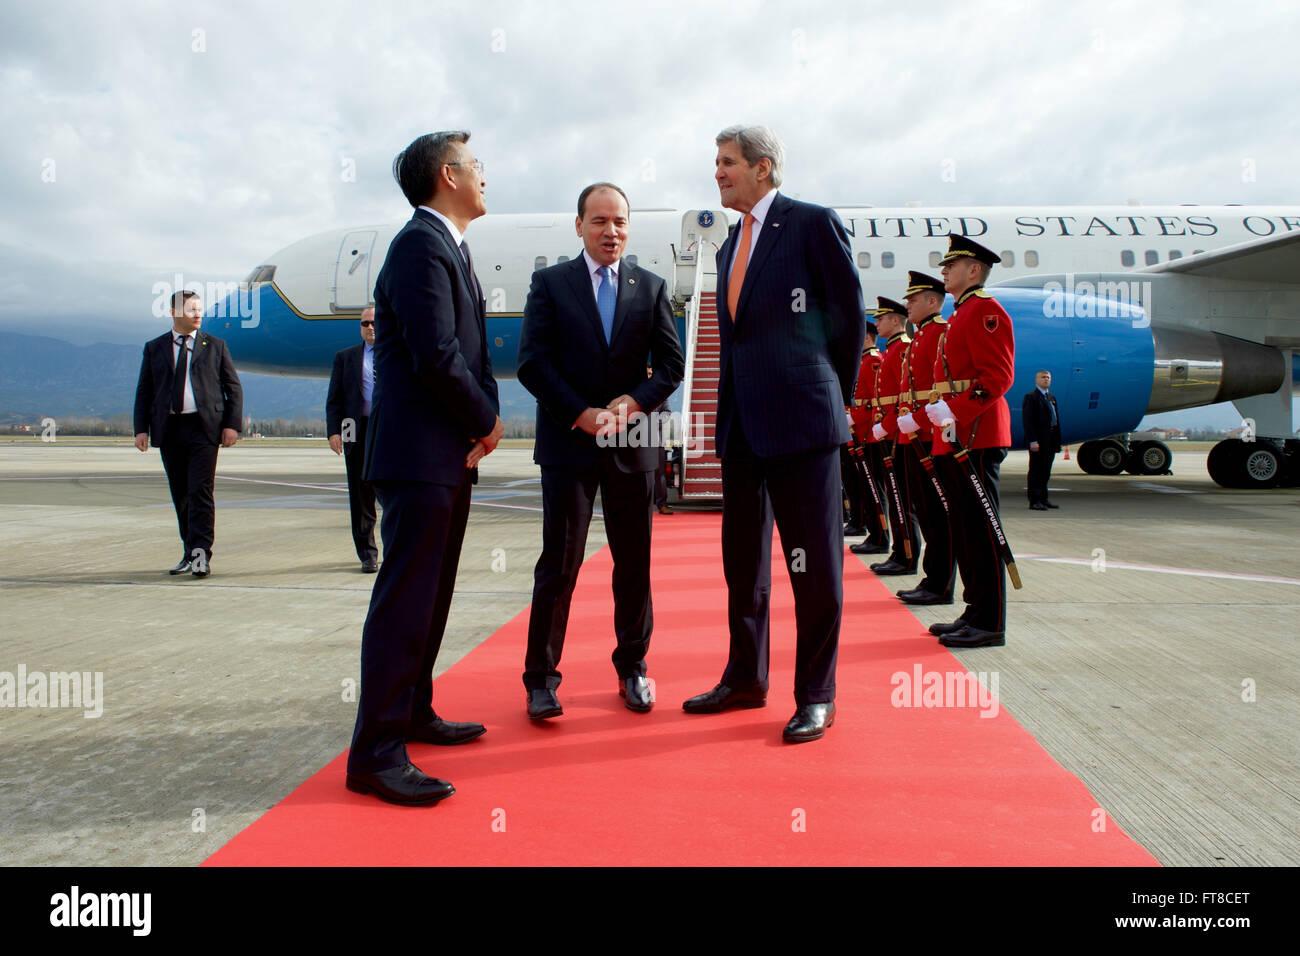 U.S. Secretary of State John Kerry, flanked by U.S. Ambassador to Albania Donald Lu, chats with Albanian President - Stock Image